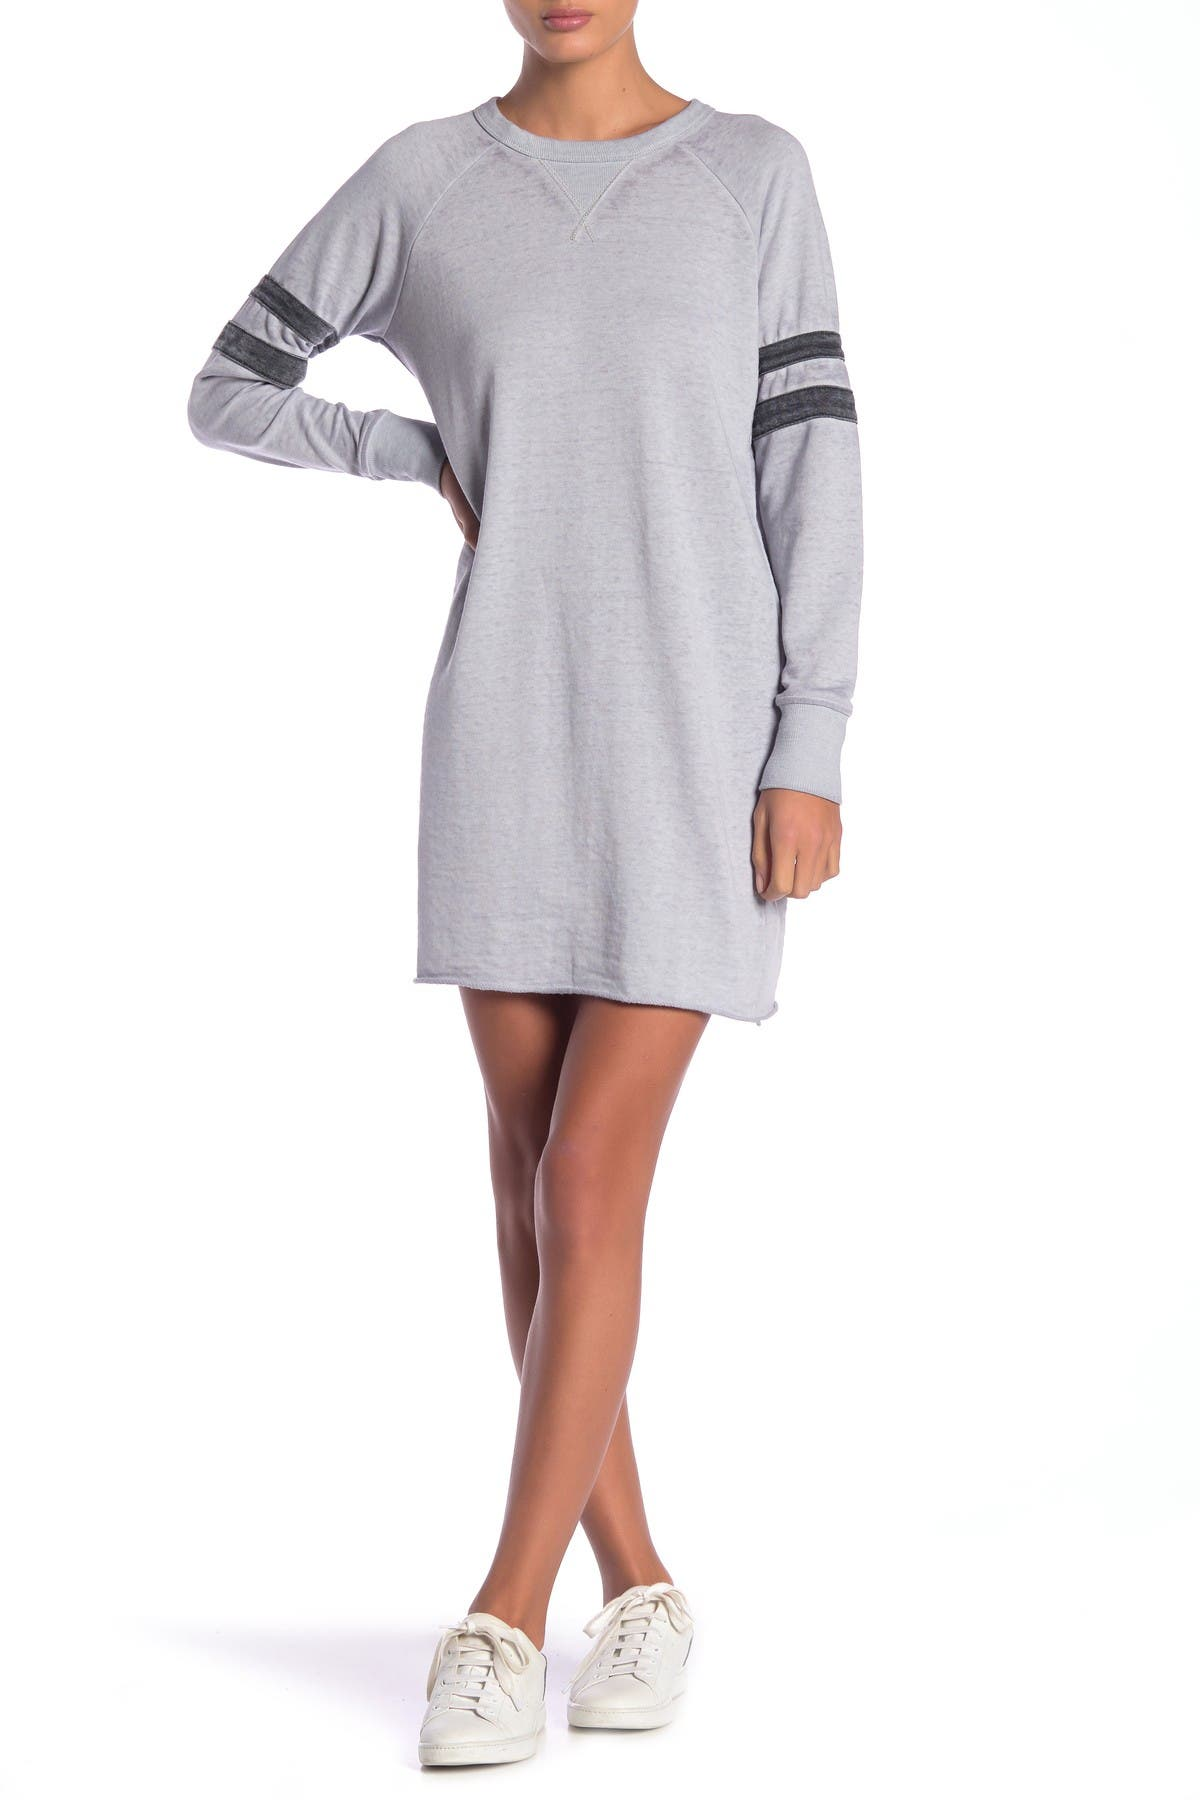 Image of Alternative Raglan Sleeve Sweatshirt Dress